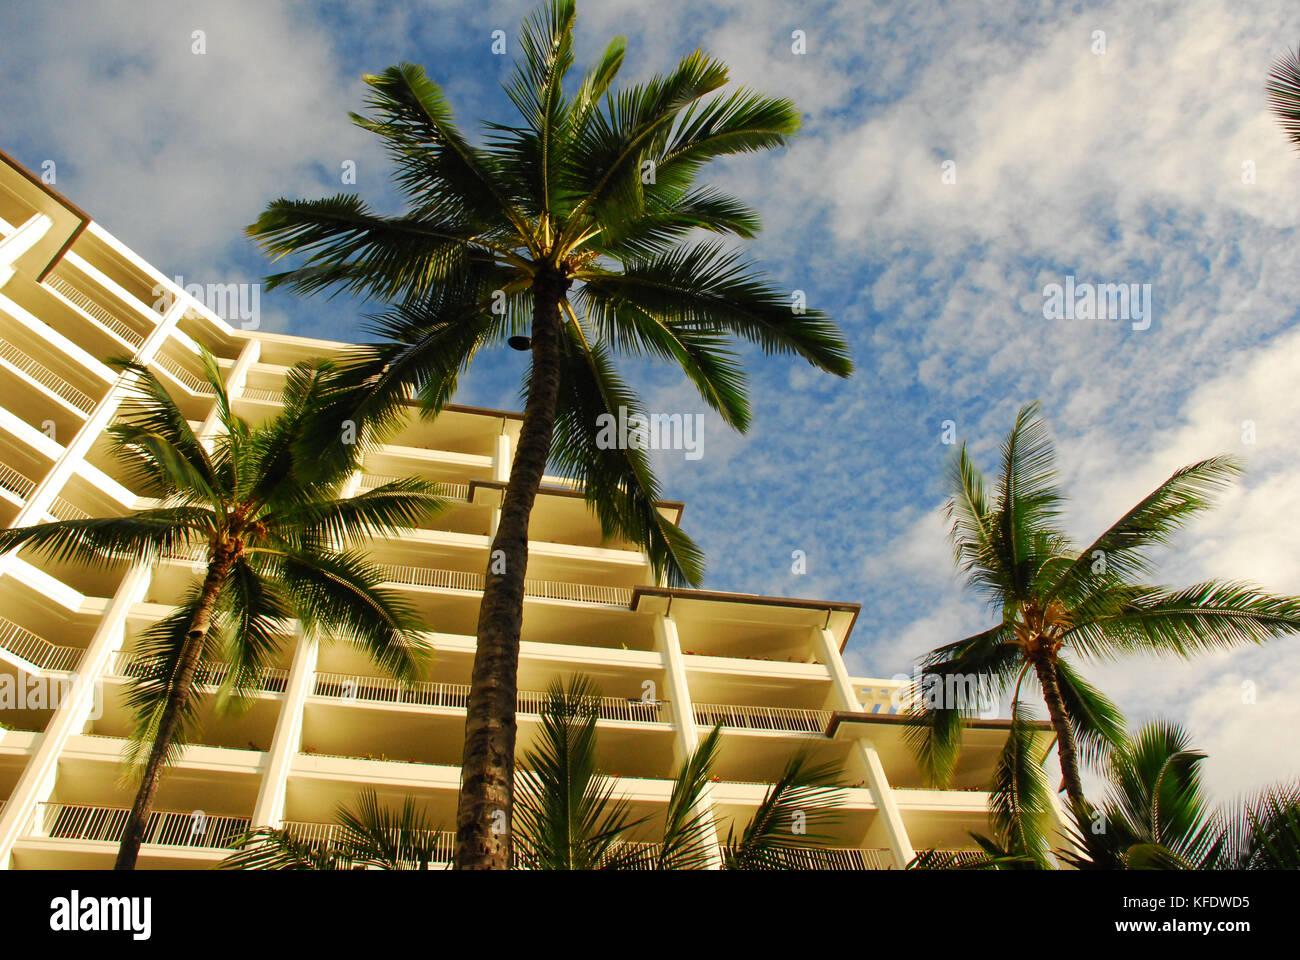 The Marriott Hotel - Ko olina Resort on Oahu, Hawaii - Stock Image